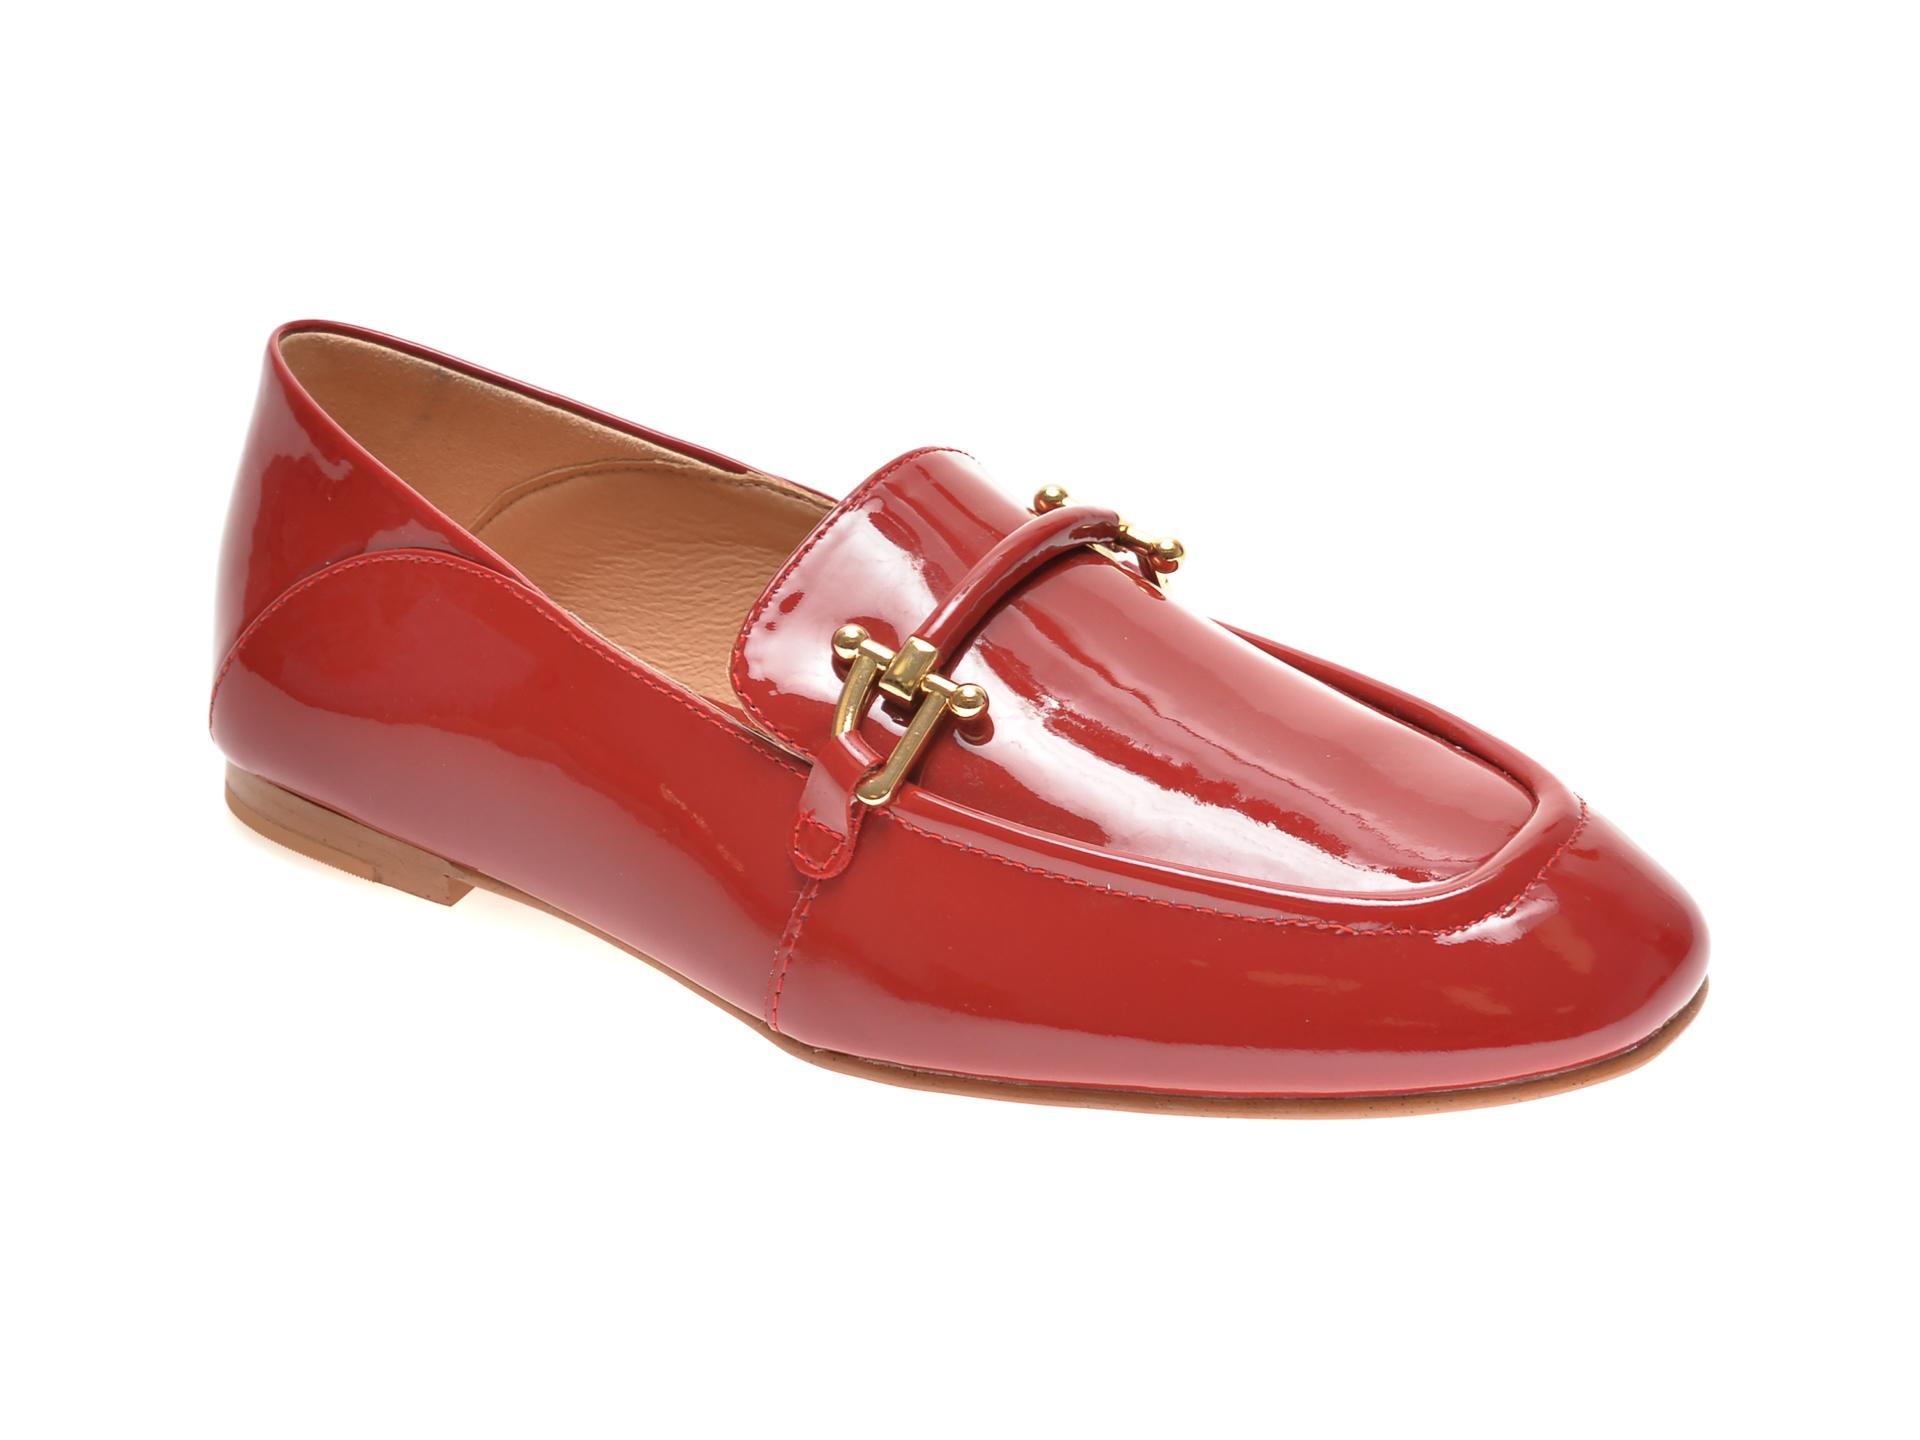 Pantofi CLARKS rosii, KAYLIN CARA, din piele naturala lacuita